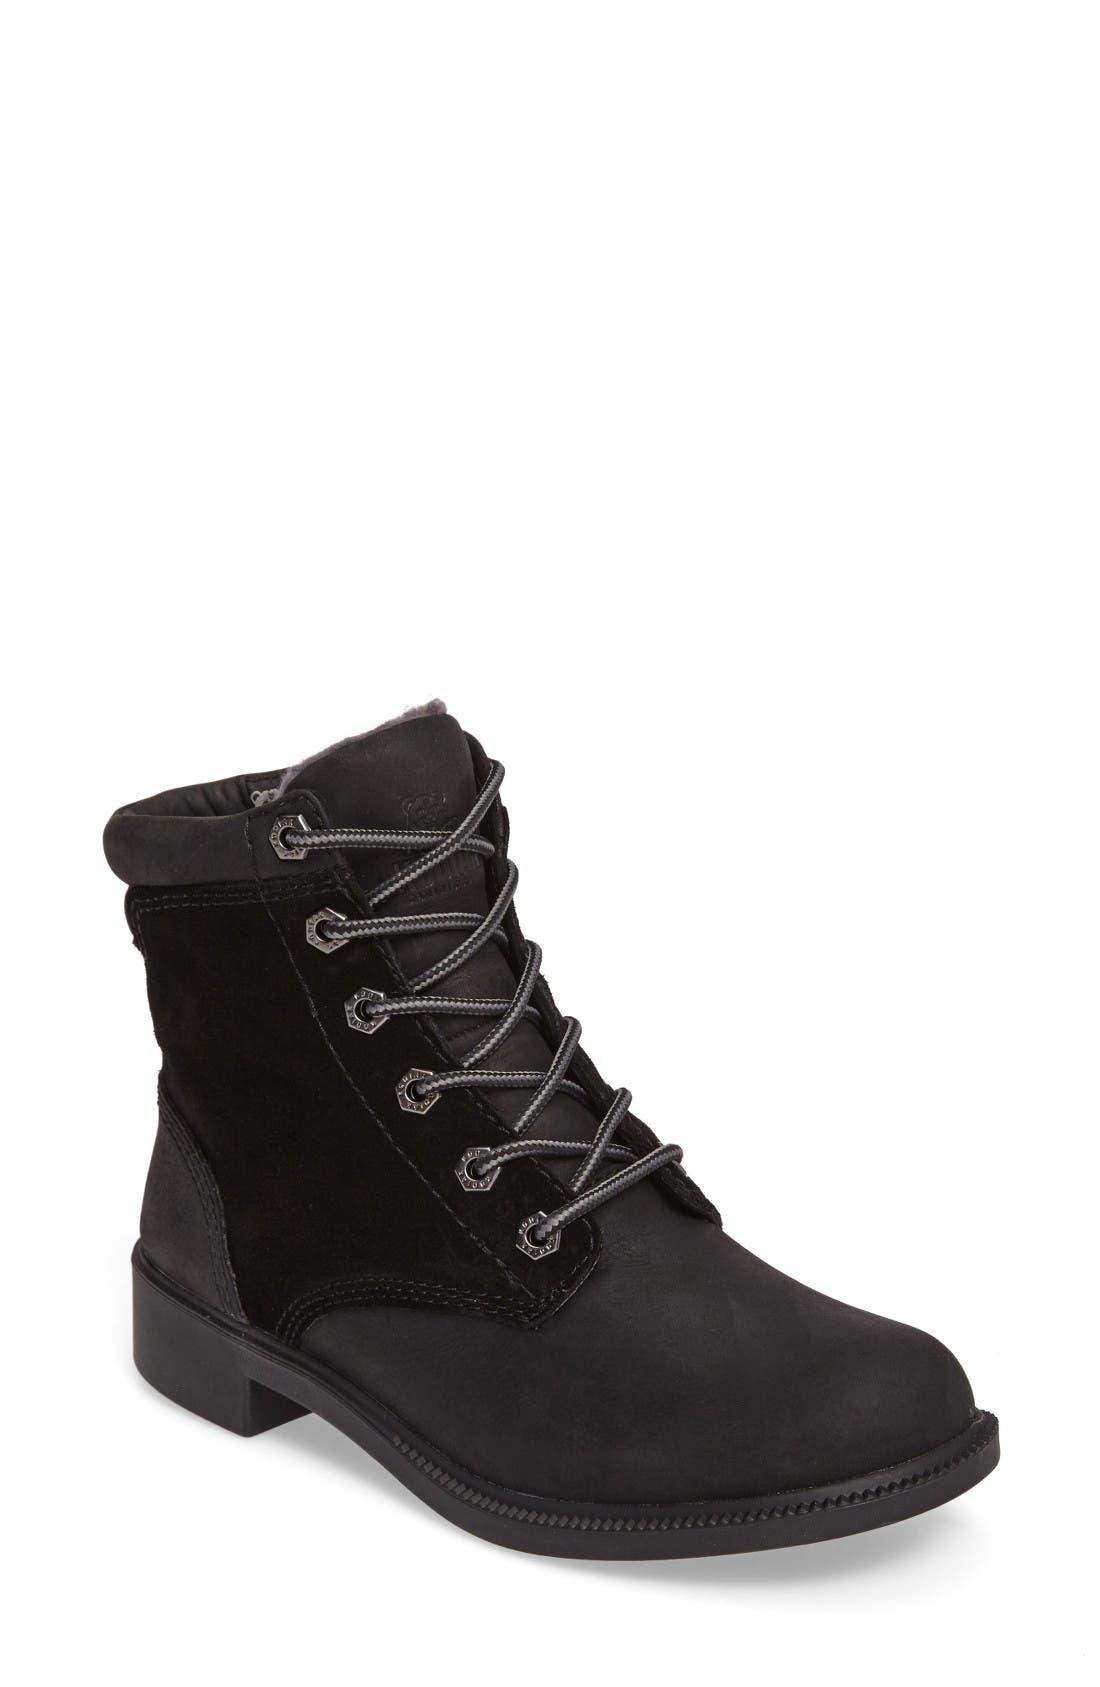 Original Waterproof Fleece Boot,                             Main thumbnail 1, color,                             Black Leather